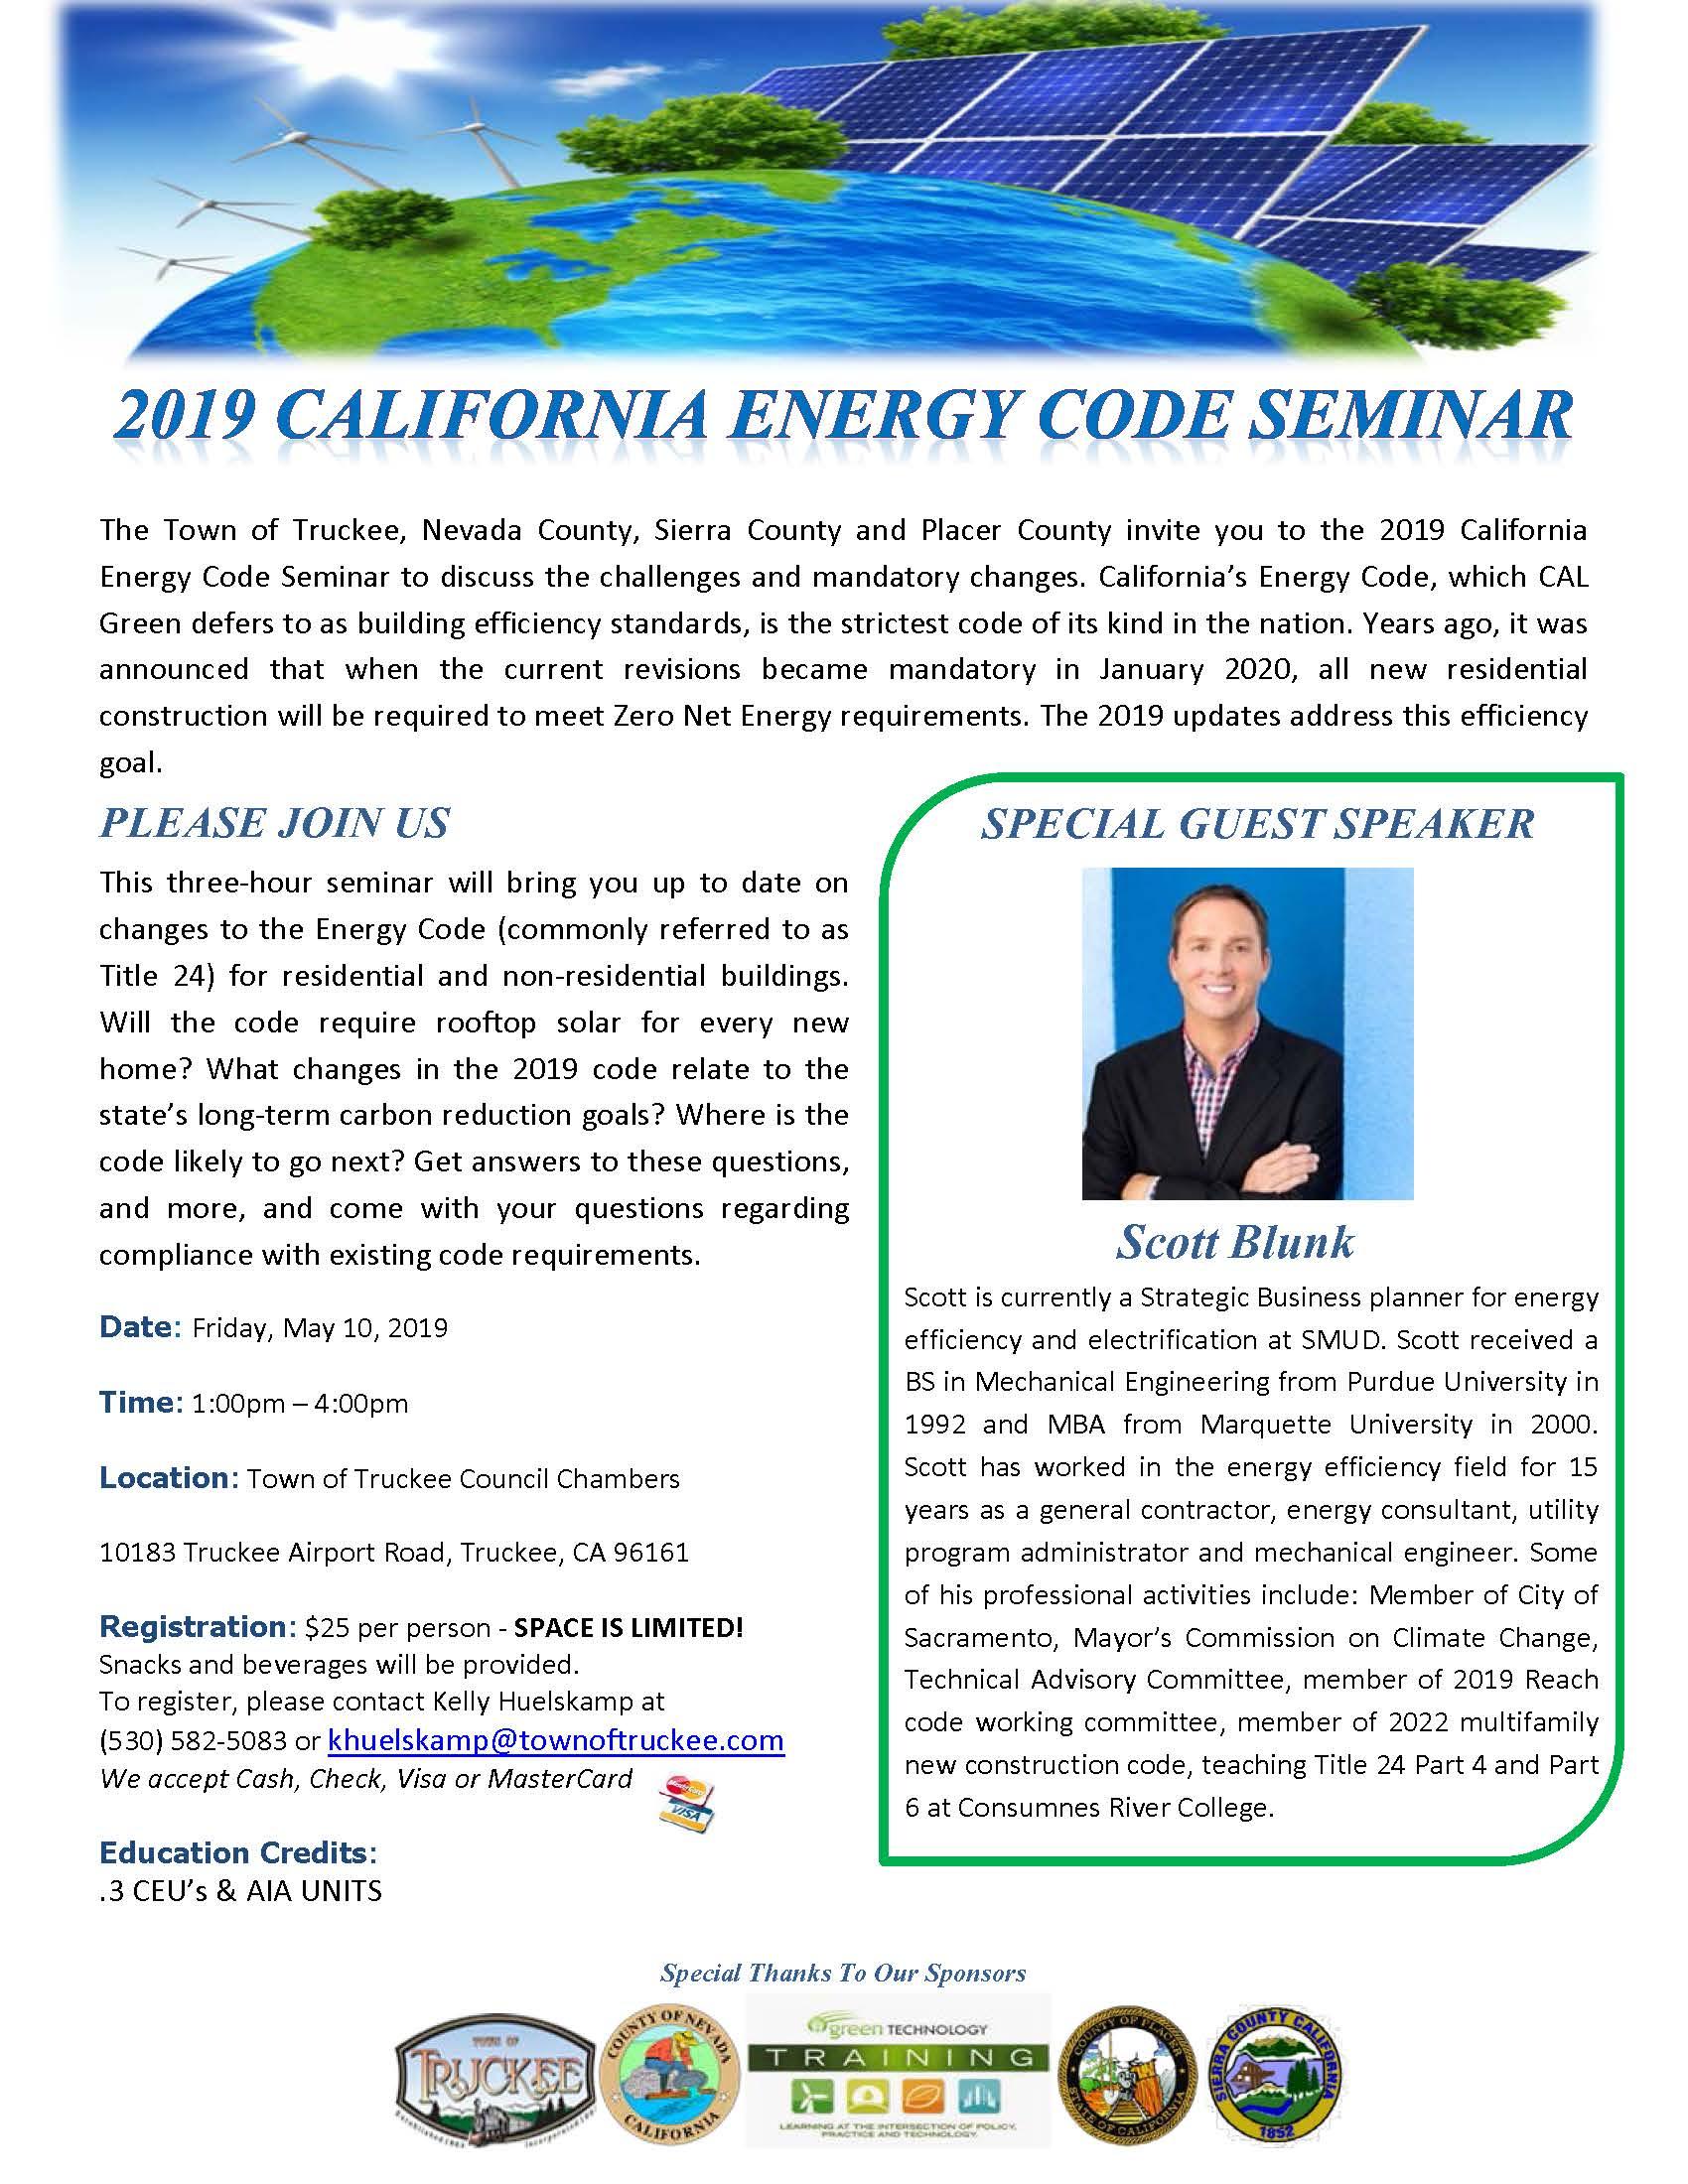 2019 Green Energy Code Seminar !